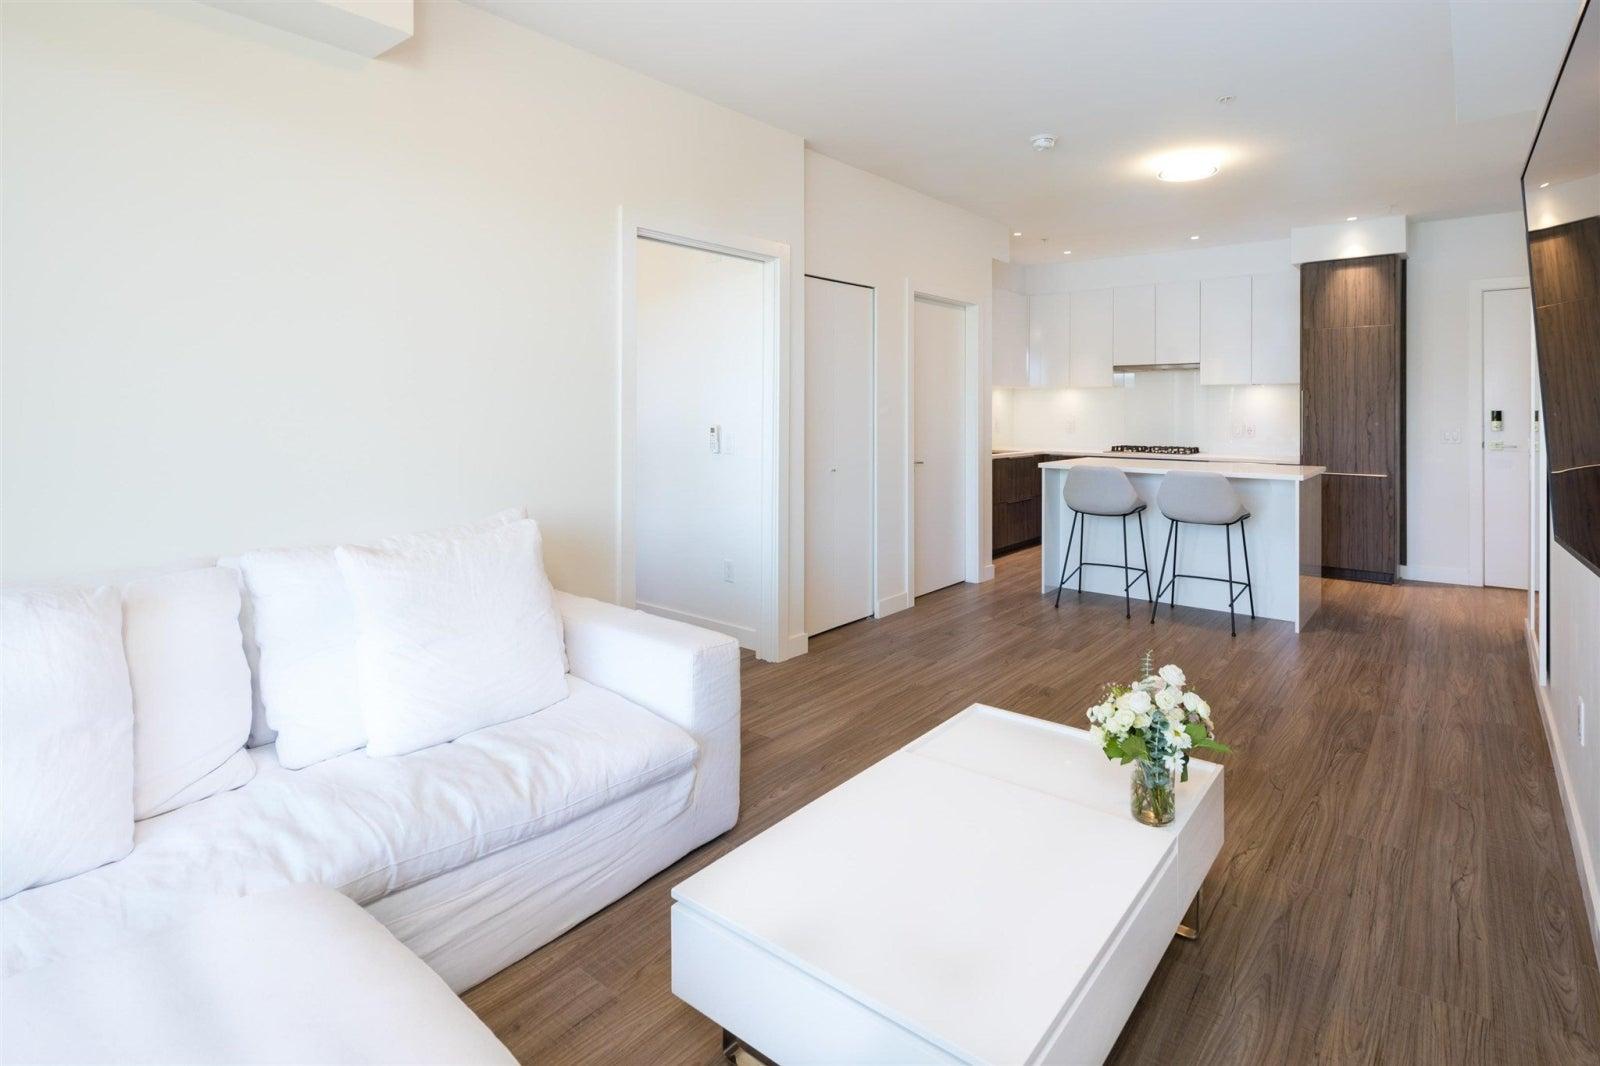 408 379 E BROADWAY AVENUE - Mount Pleasant VE Apartment/Condo for sale, 2 Bedrooms (R2599900) #10